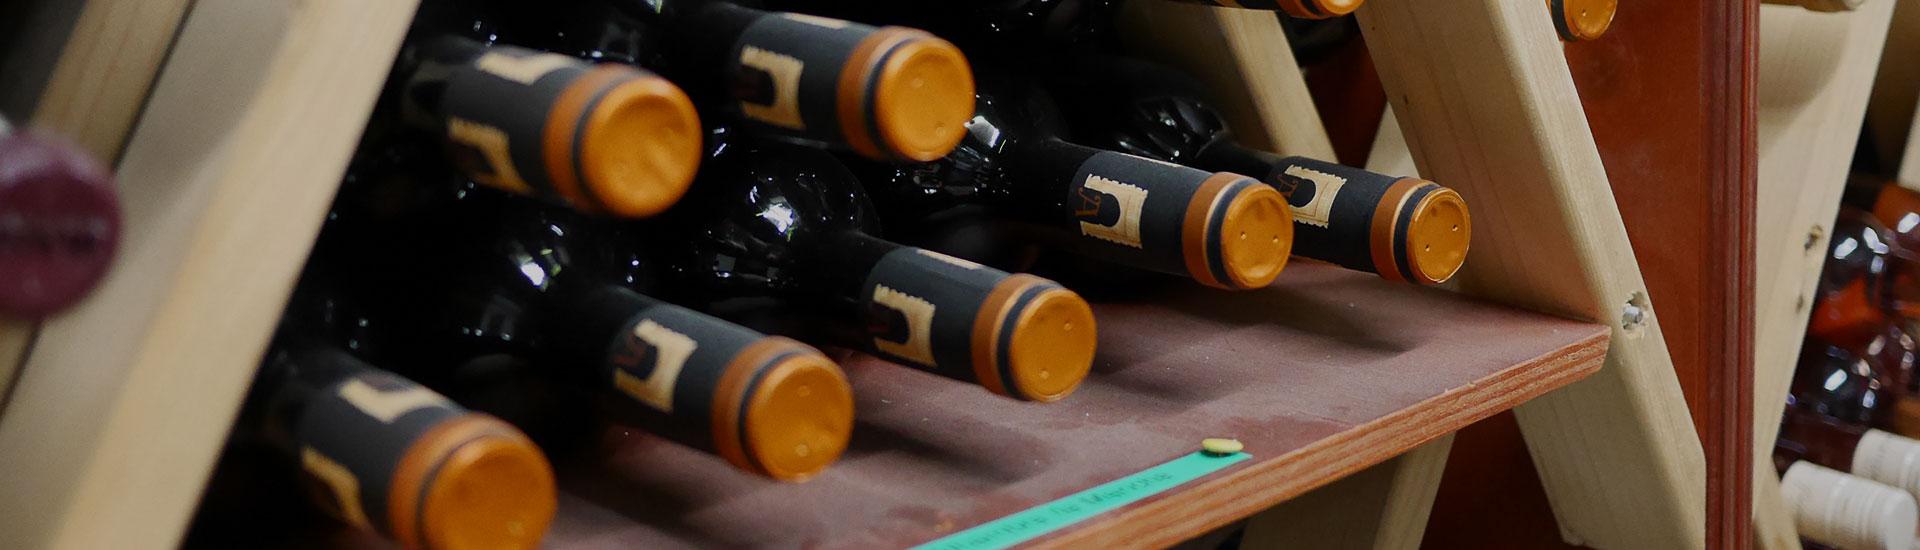 Carte des vins Auberge de Gilly